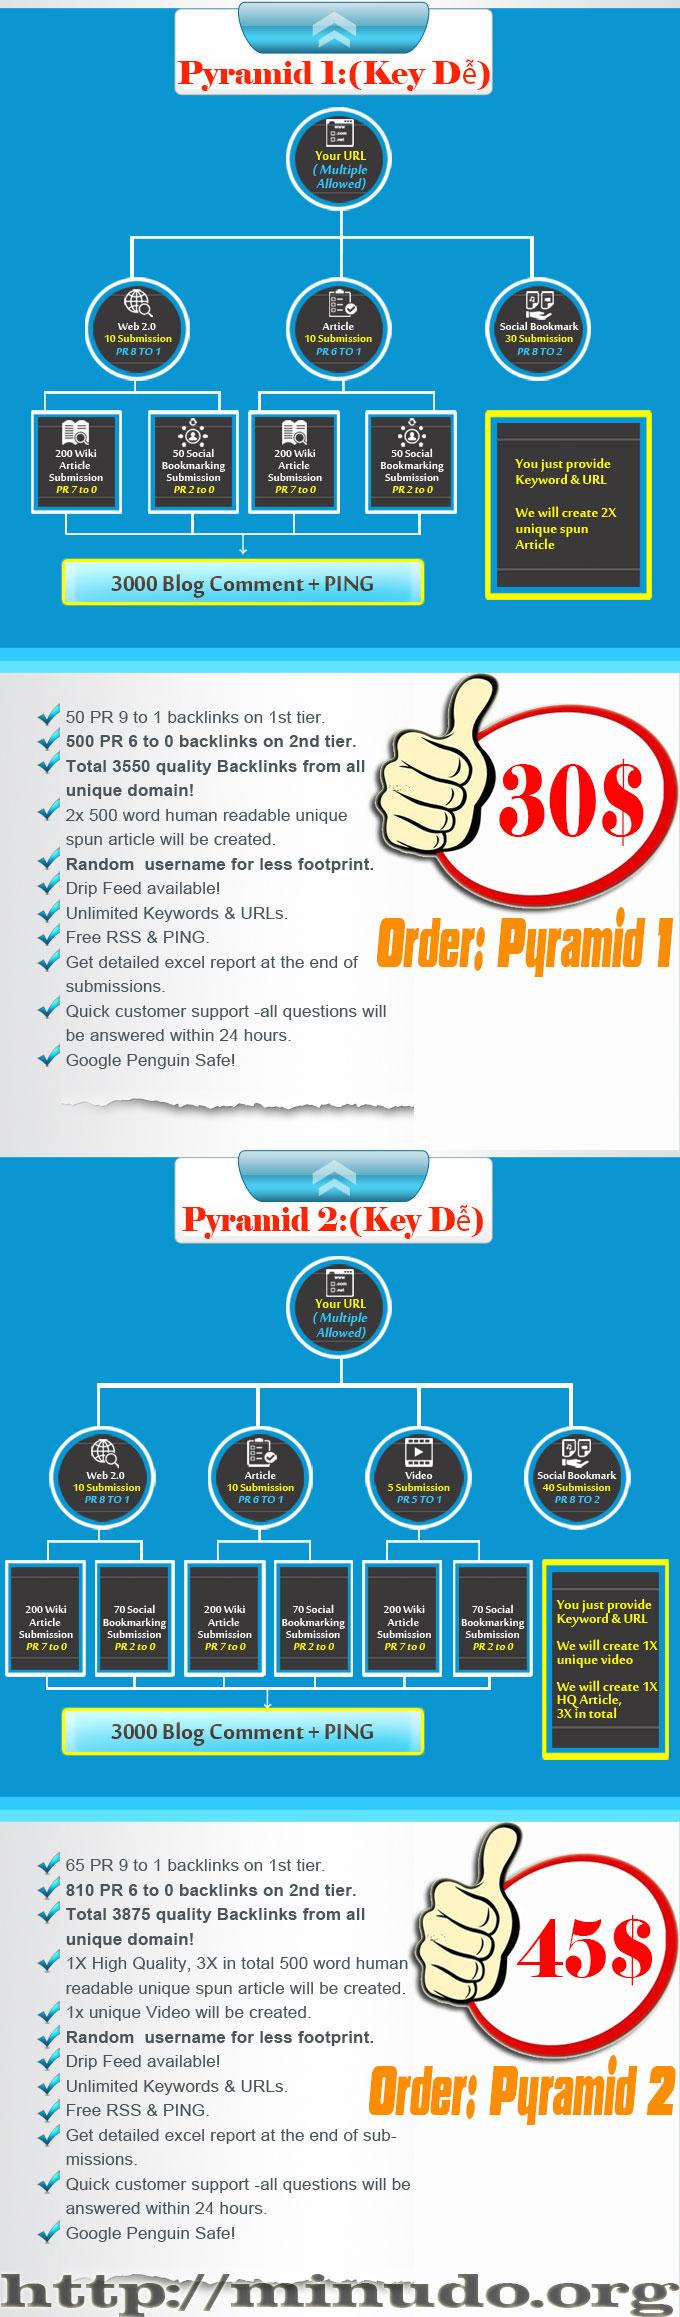 pyramid-1-2-minudo-org